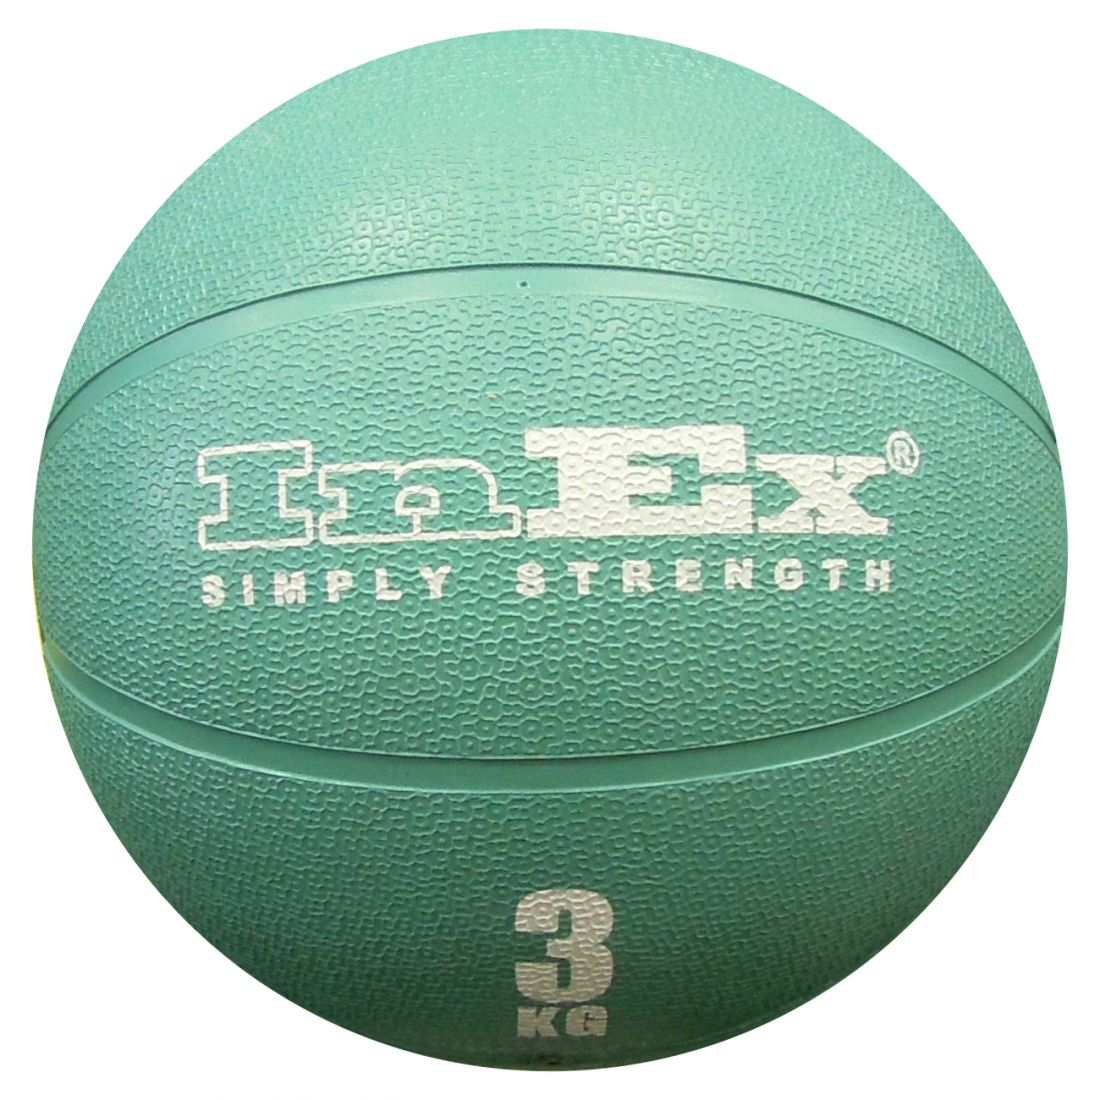 IN/MBR-3 Мяч набивной медицинский 3 кг InEx